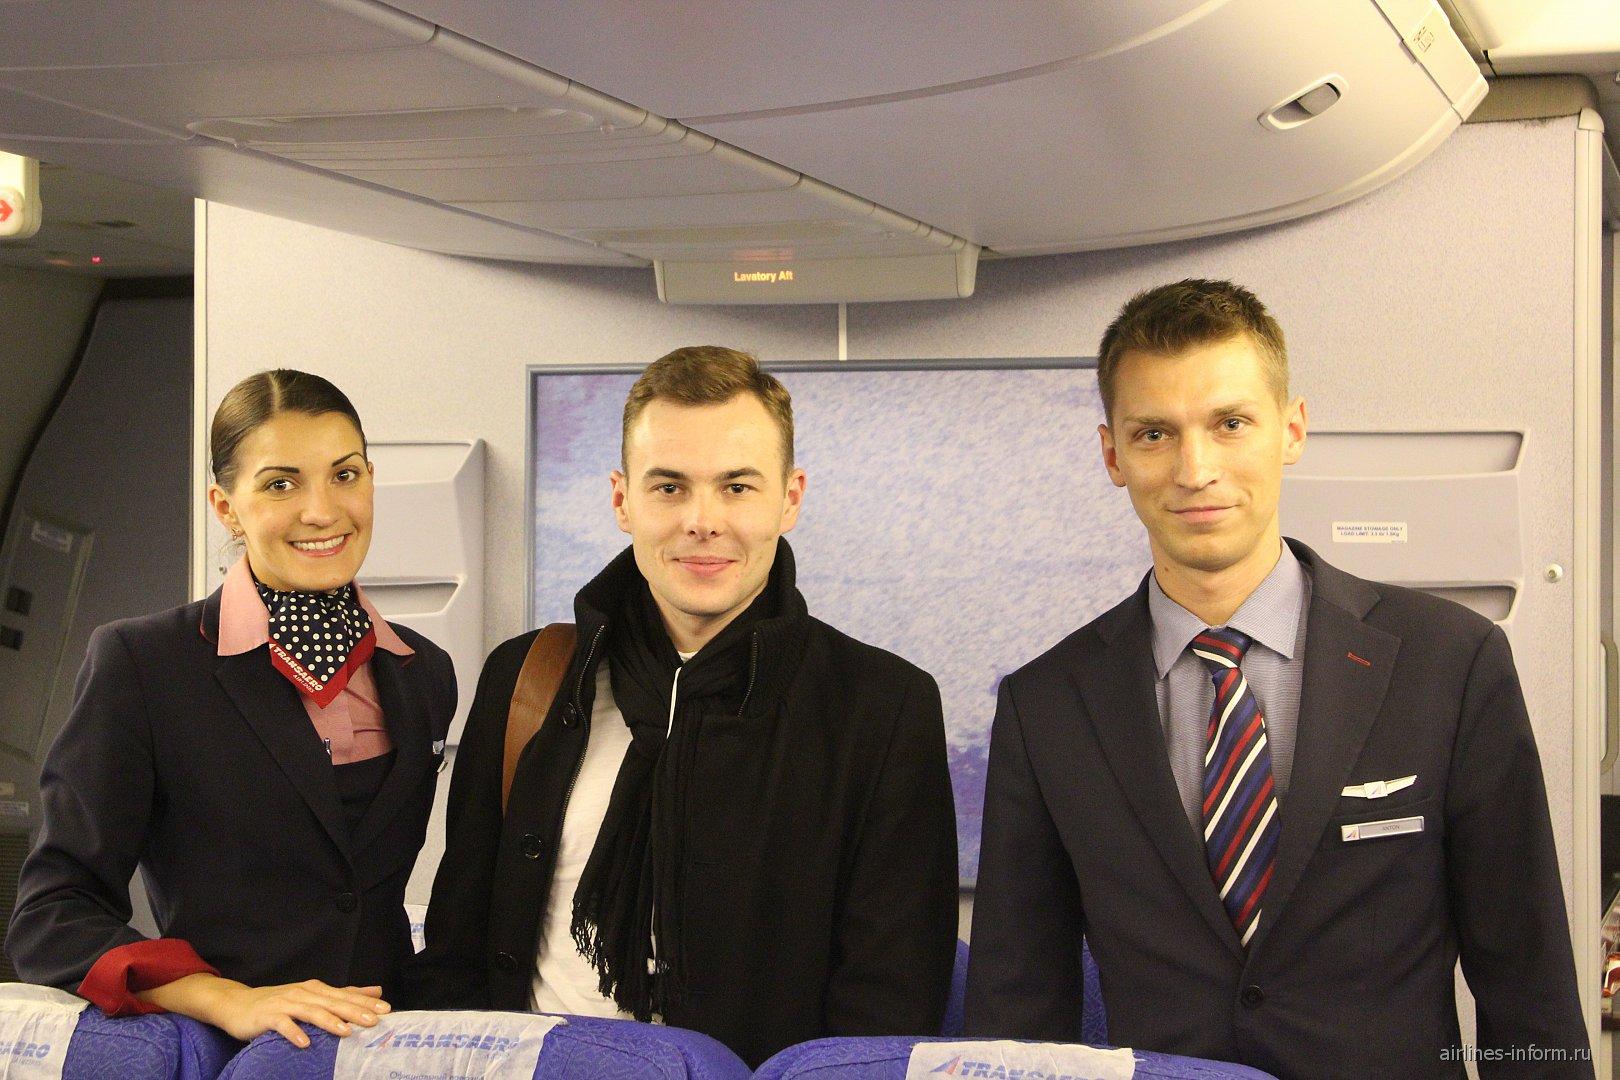 Фото с бортпроводниками авиакомпании Трансаэро